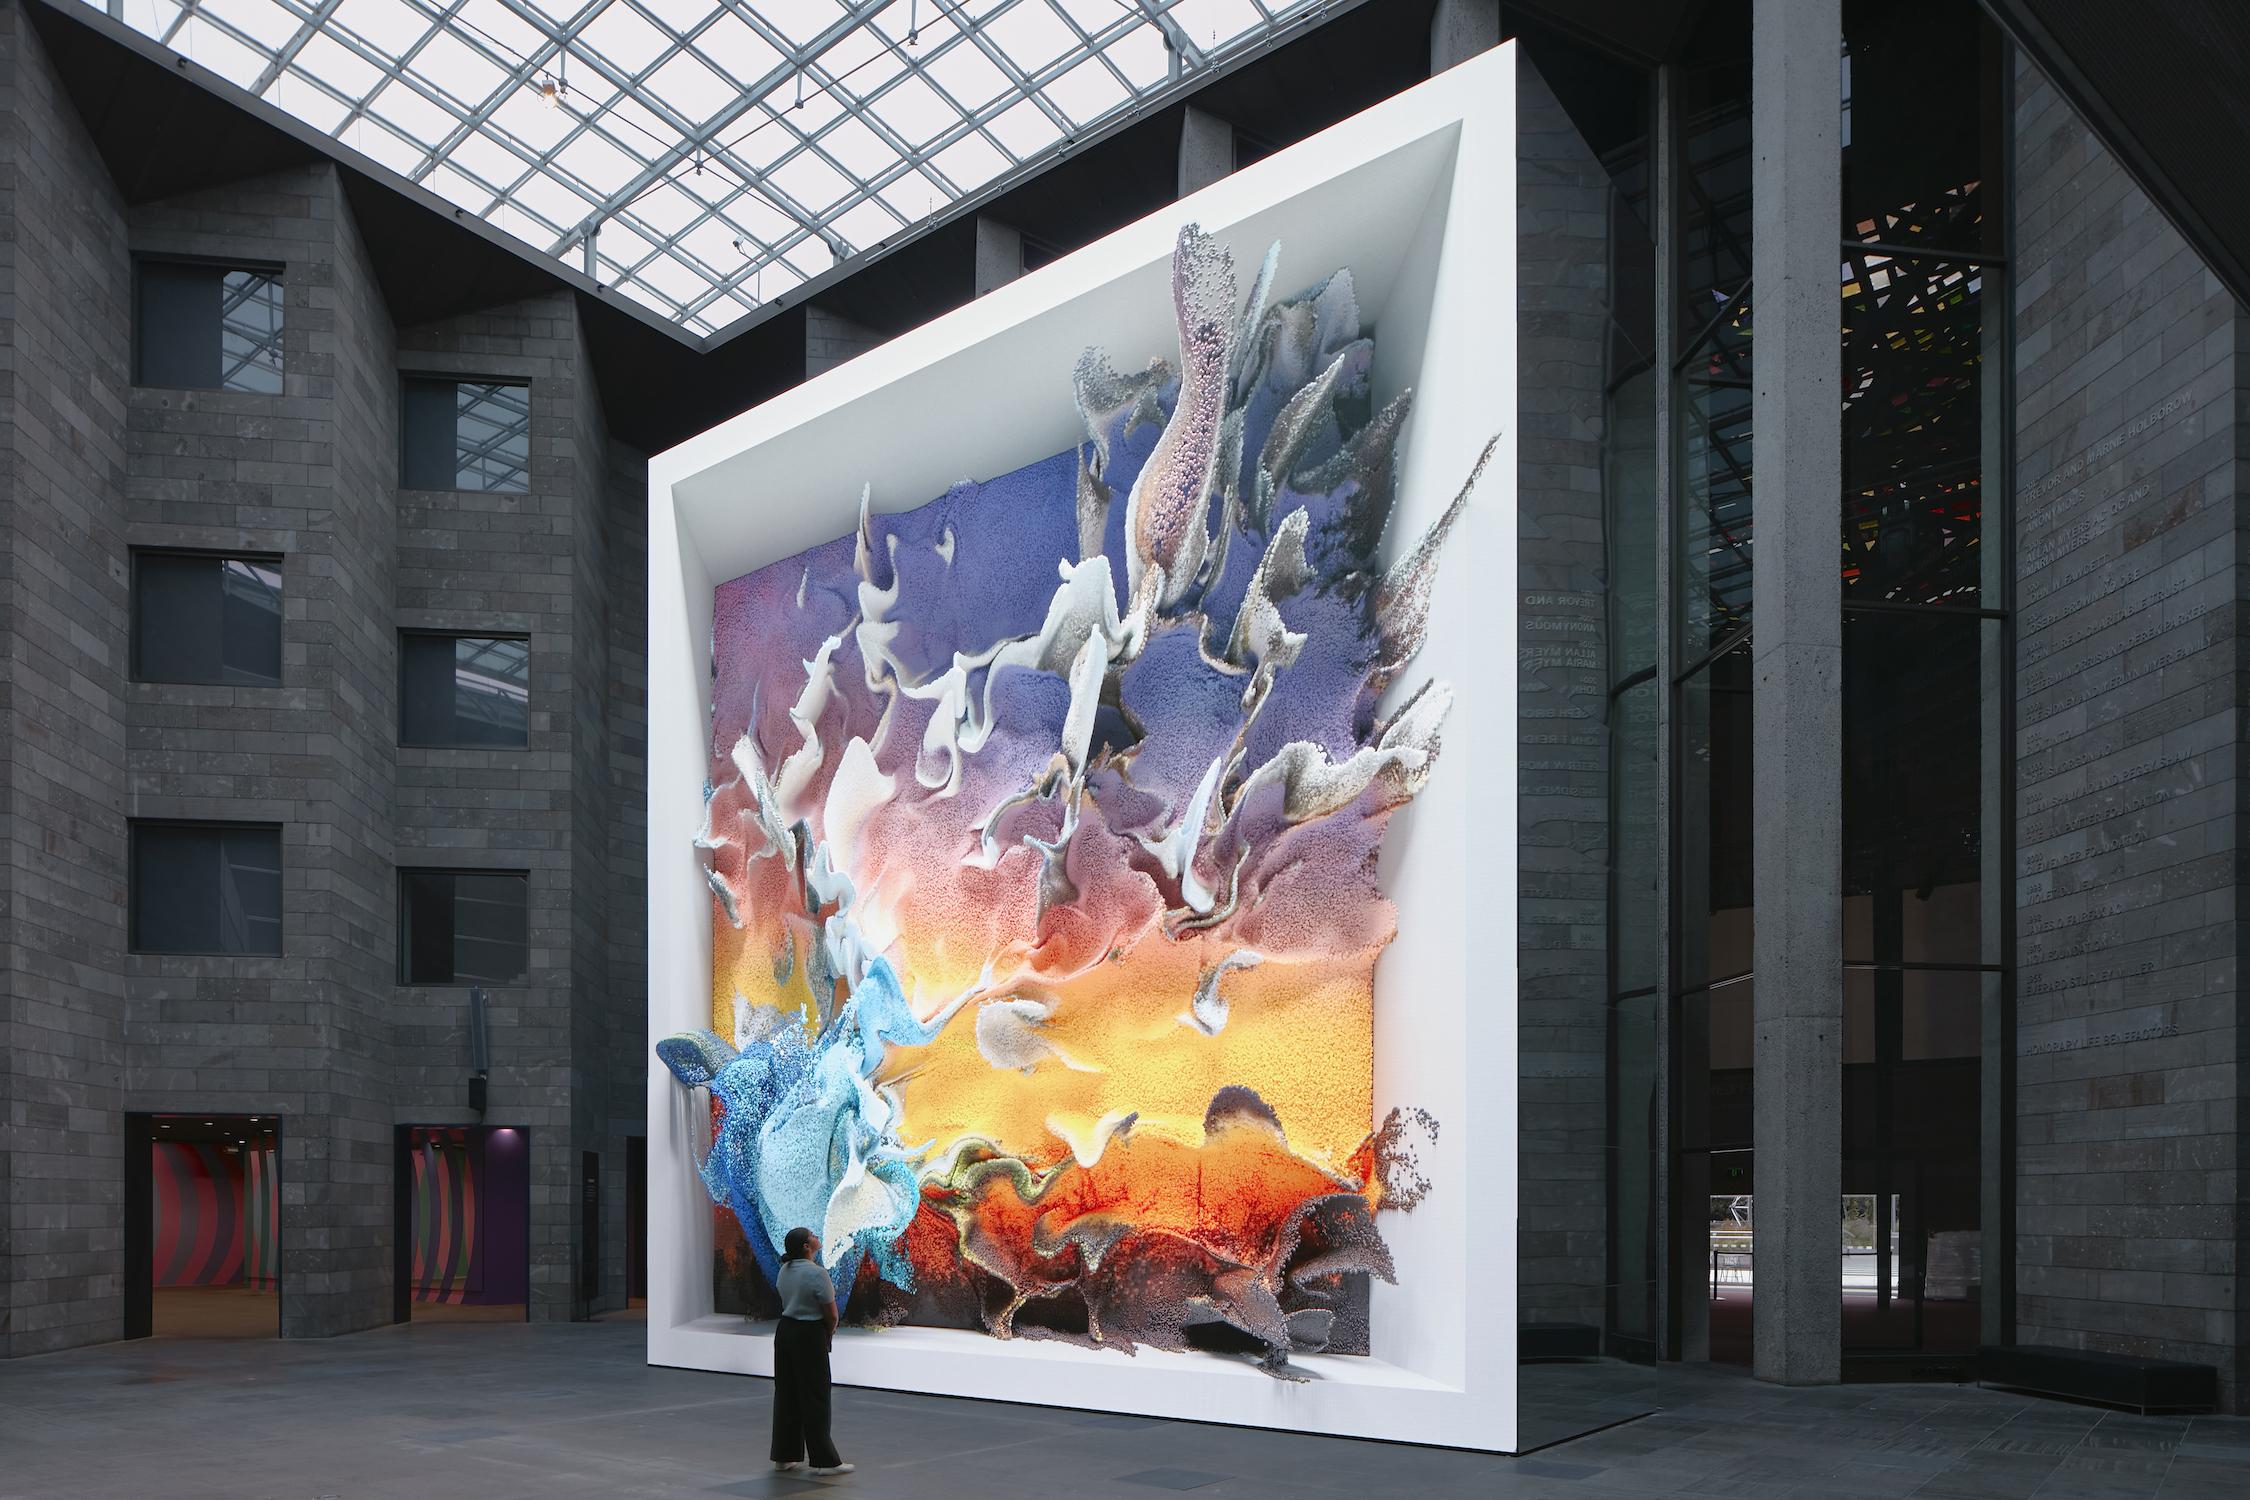 Installation view of Refik Anadol 'Quantum Memories 2020' at NGV Triennial